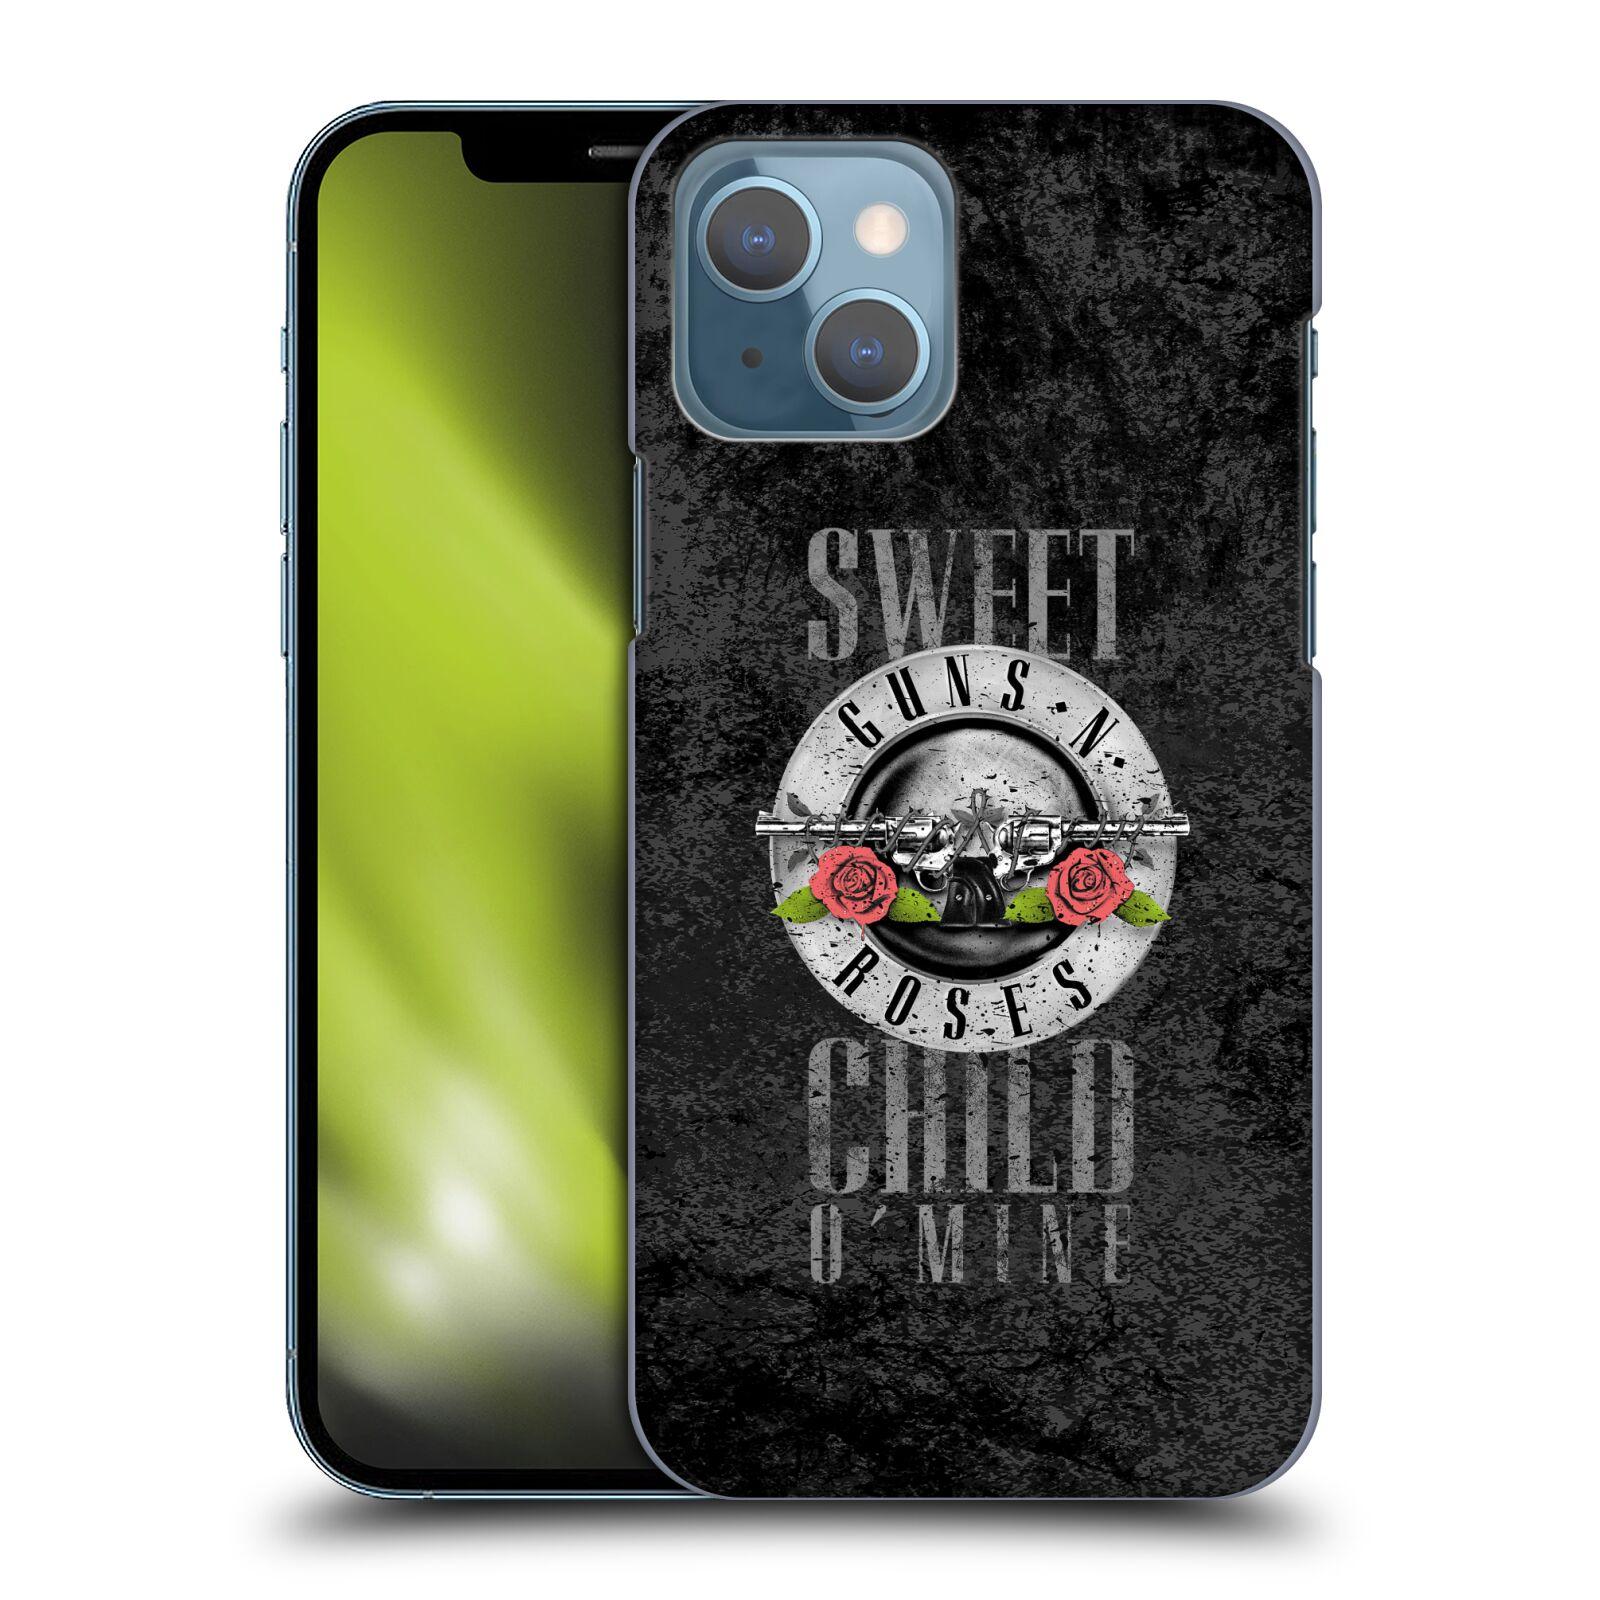 Plastové pouzdro na mobil Apple iPhone 13 - Head Case - Guns N' Roses - Sweet Child